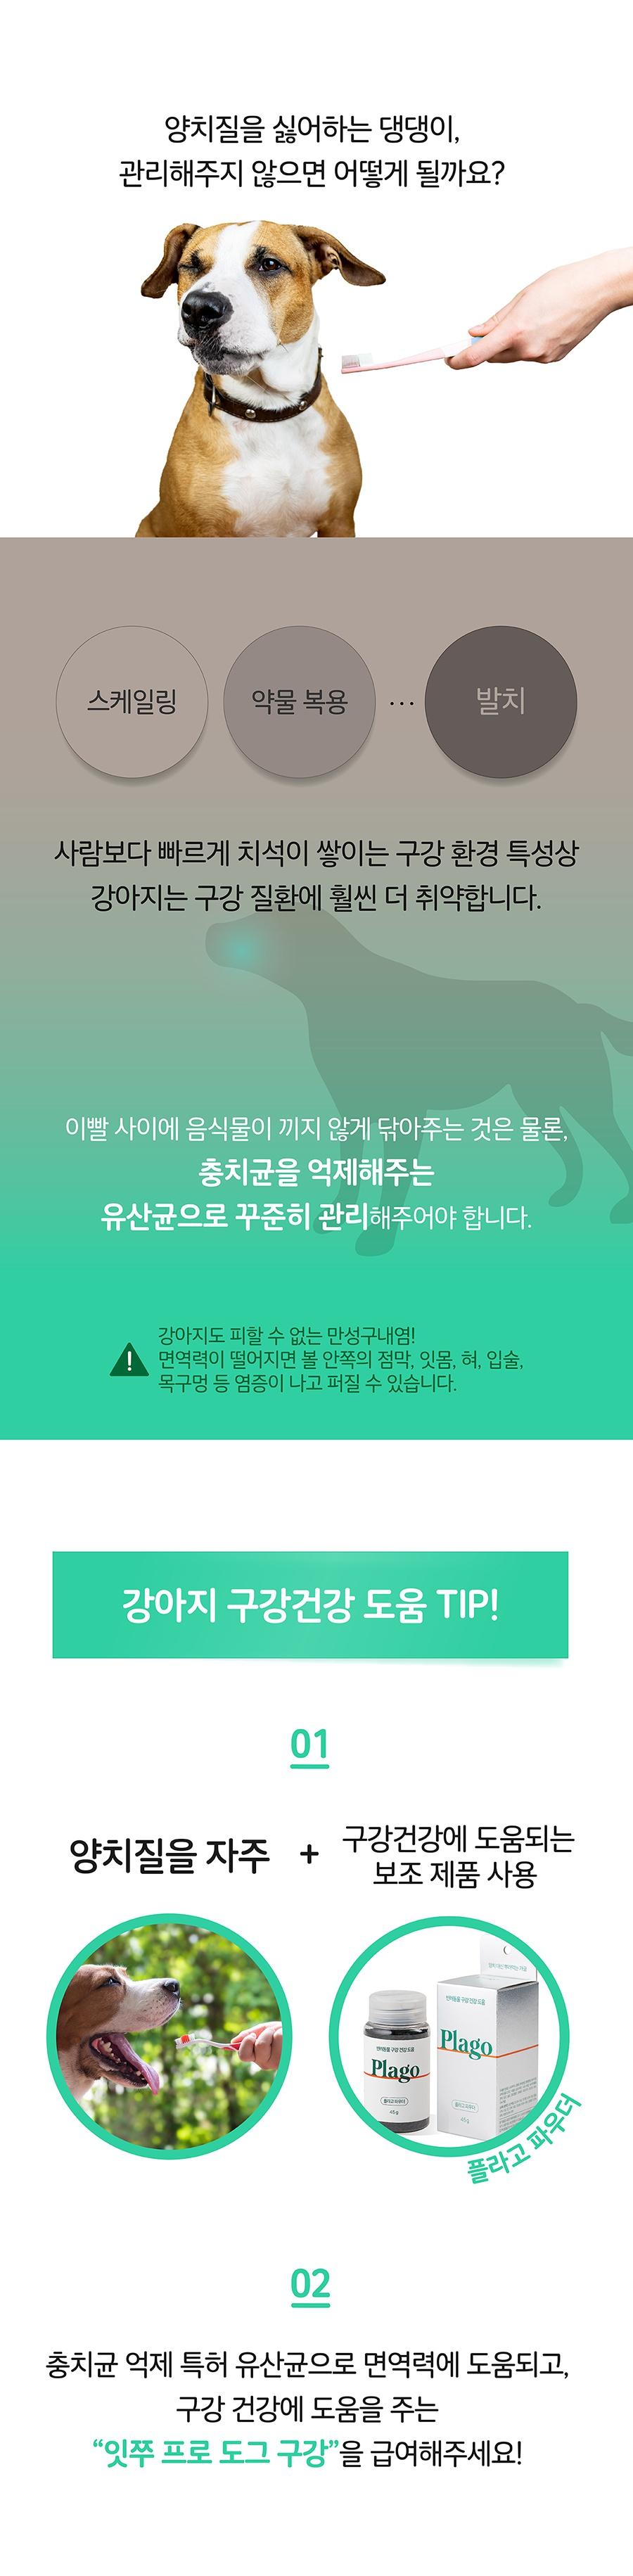 it 잇쭈 프로 도그 구강 특대용량 (8개입*8개)-상품이미지-2